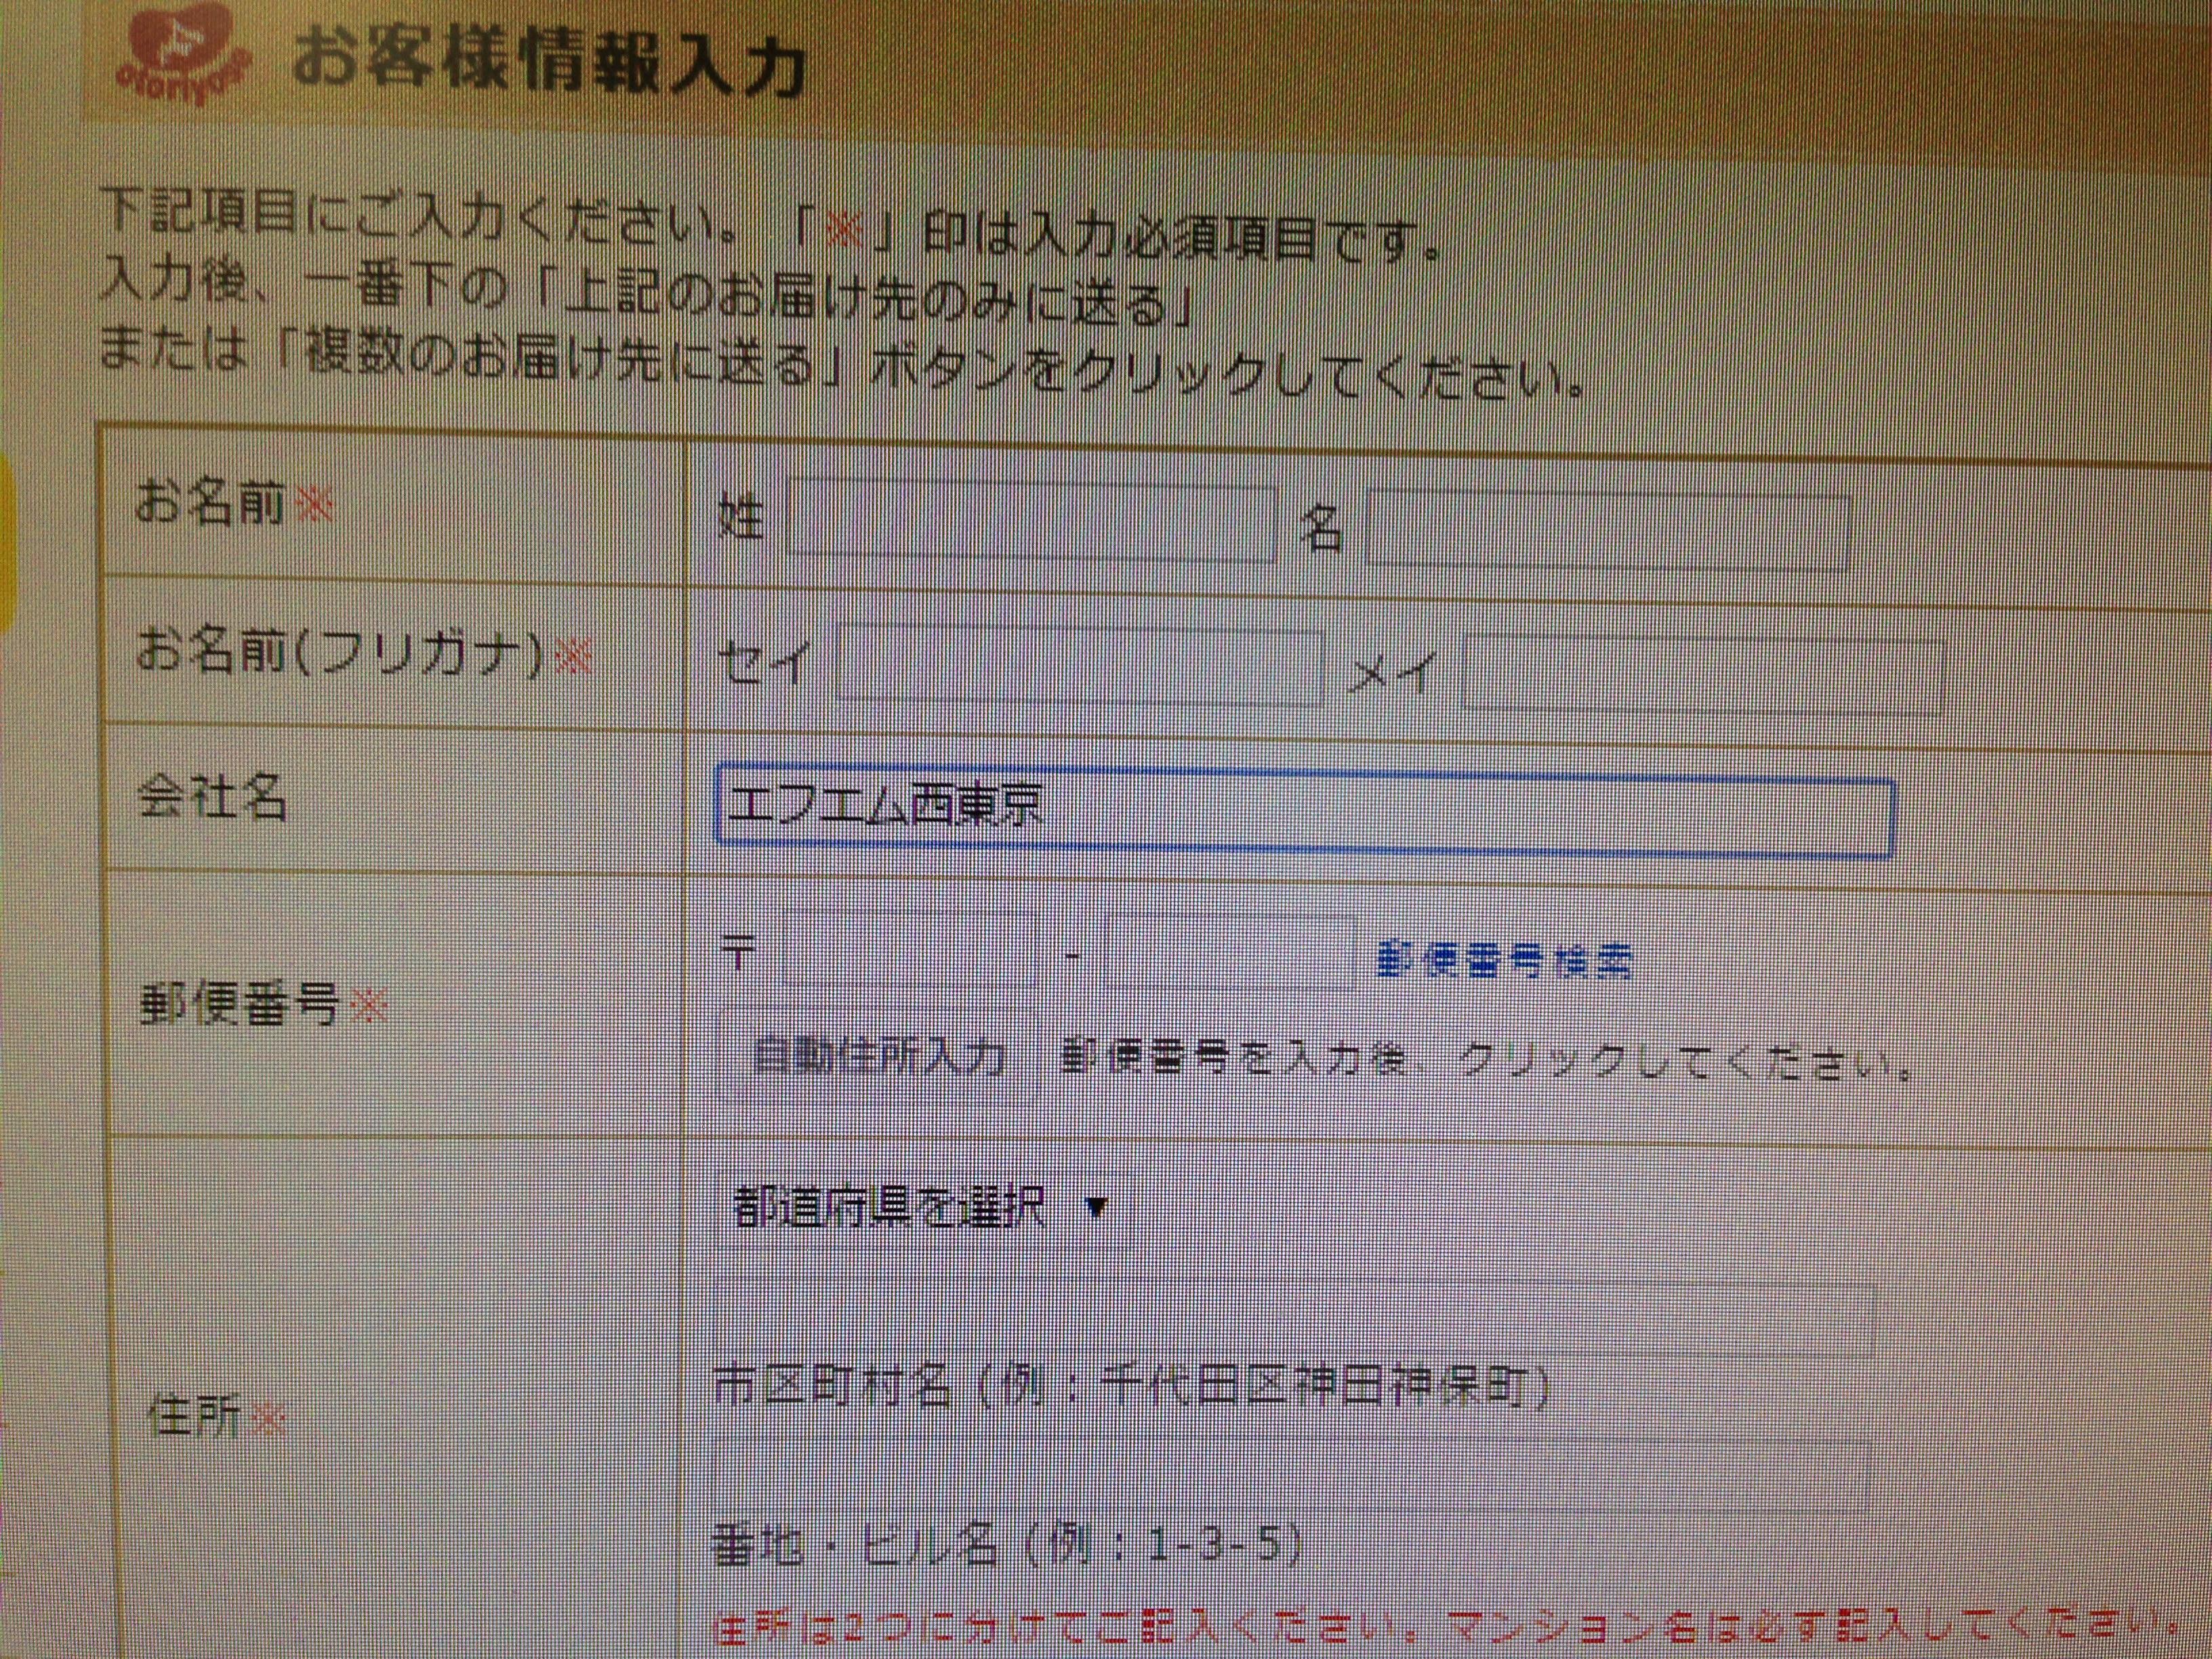 IMG_4469亜.JPG